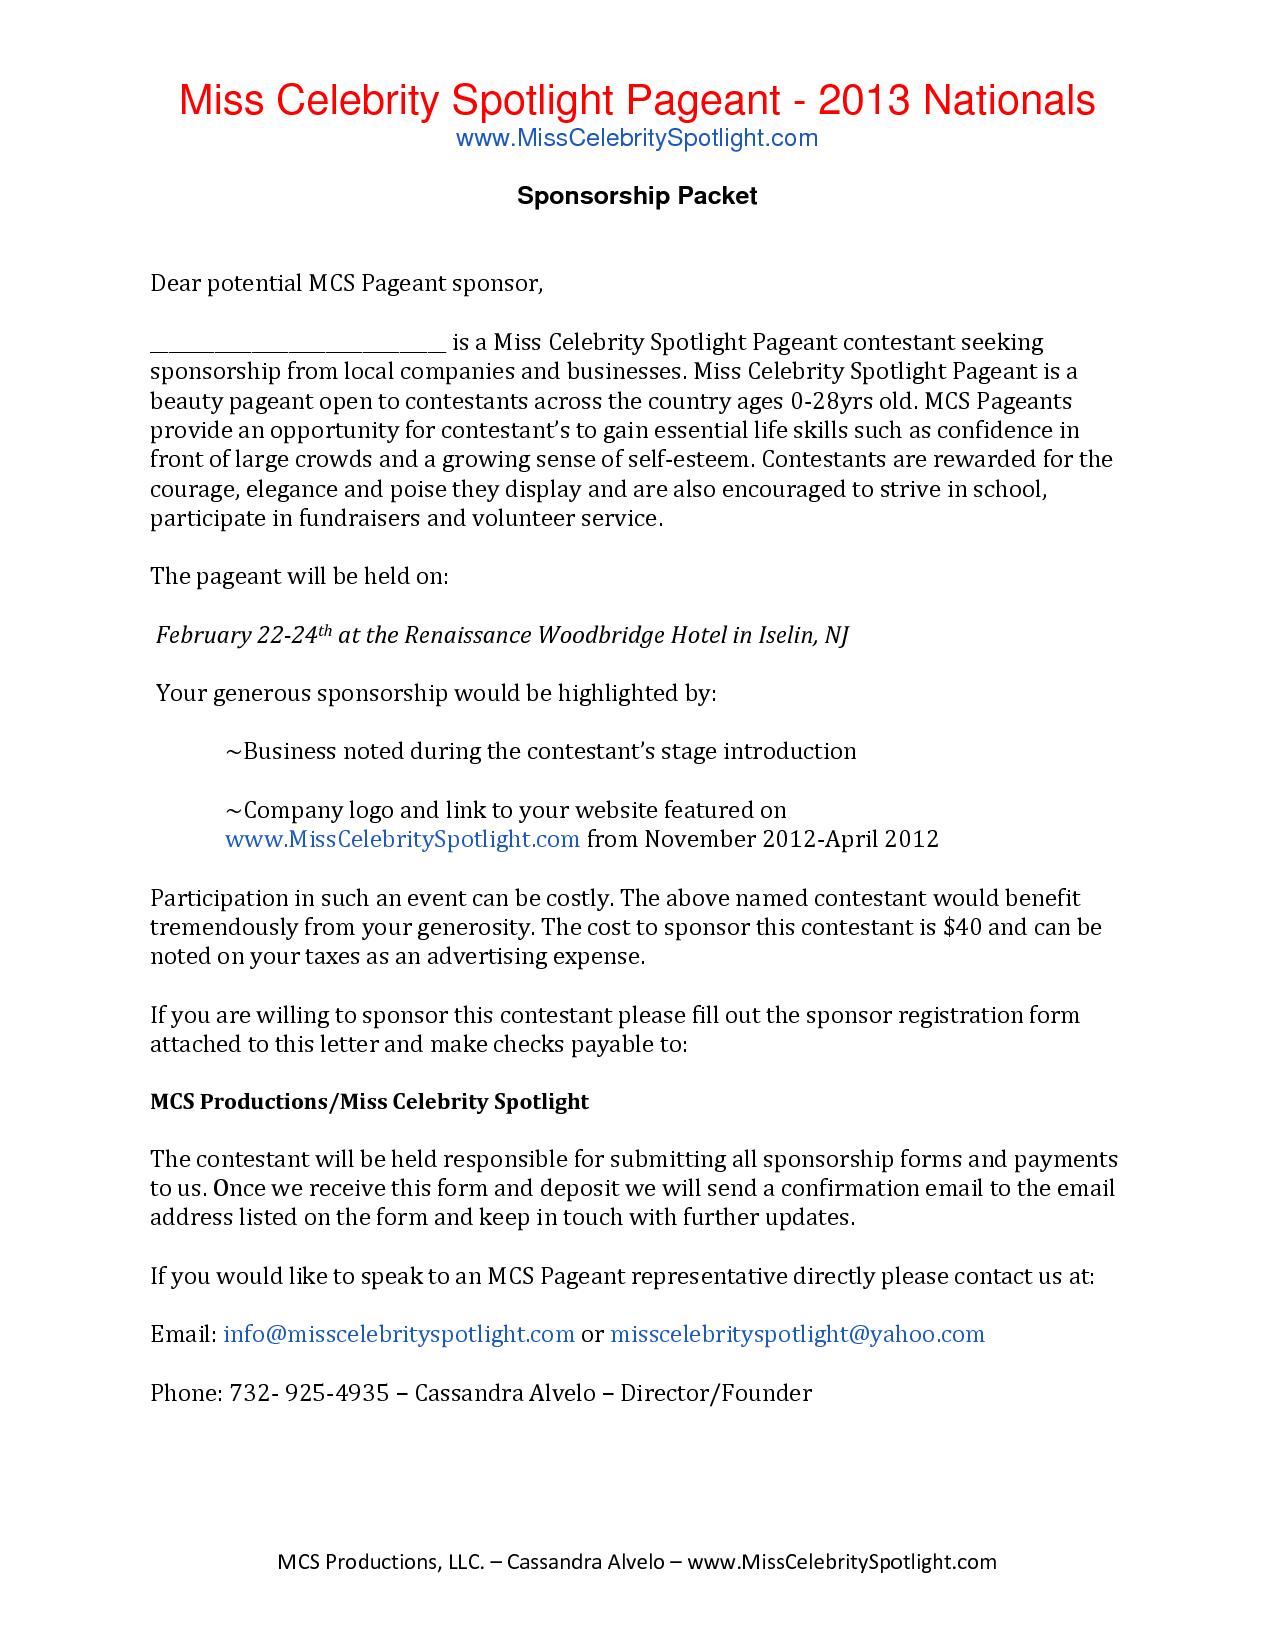 Pageant sponsorship letter Sponsorship letter, Proposal